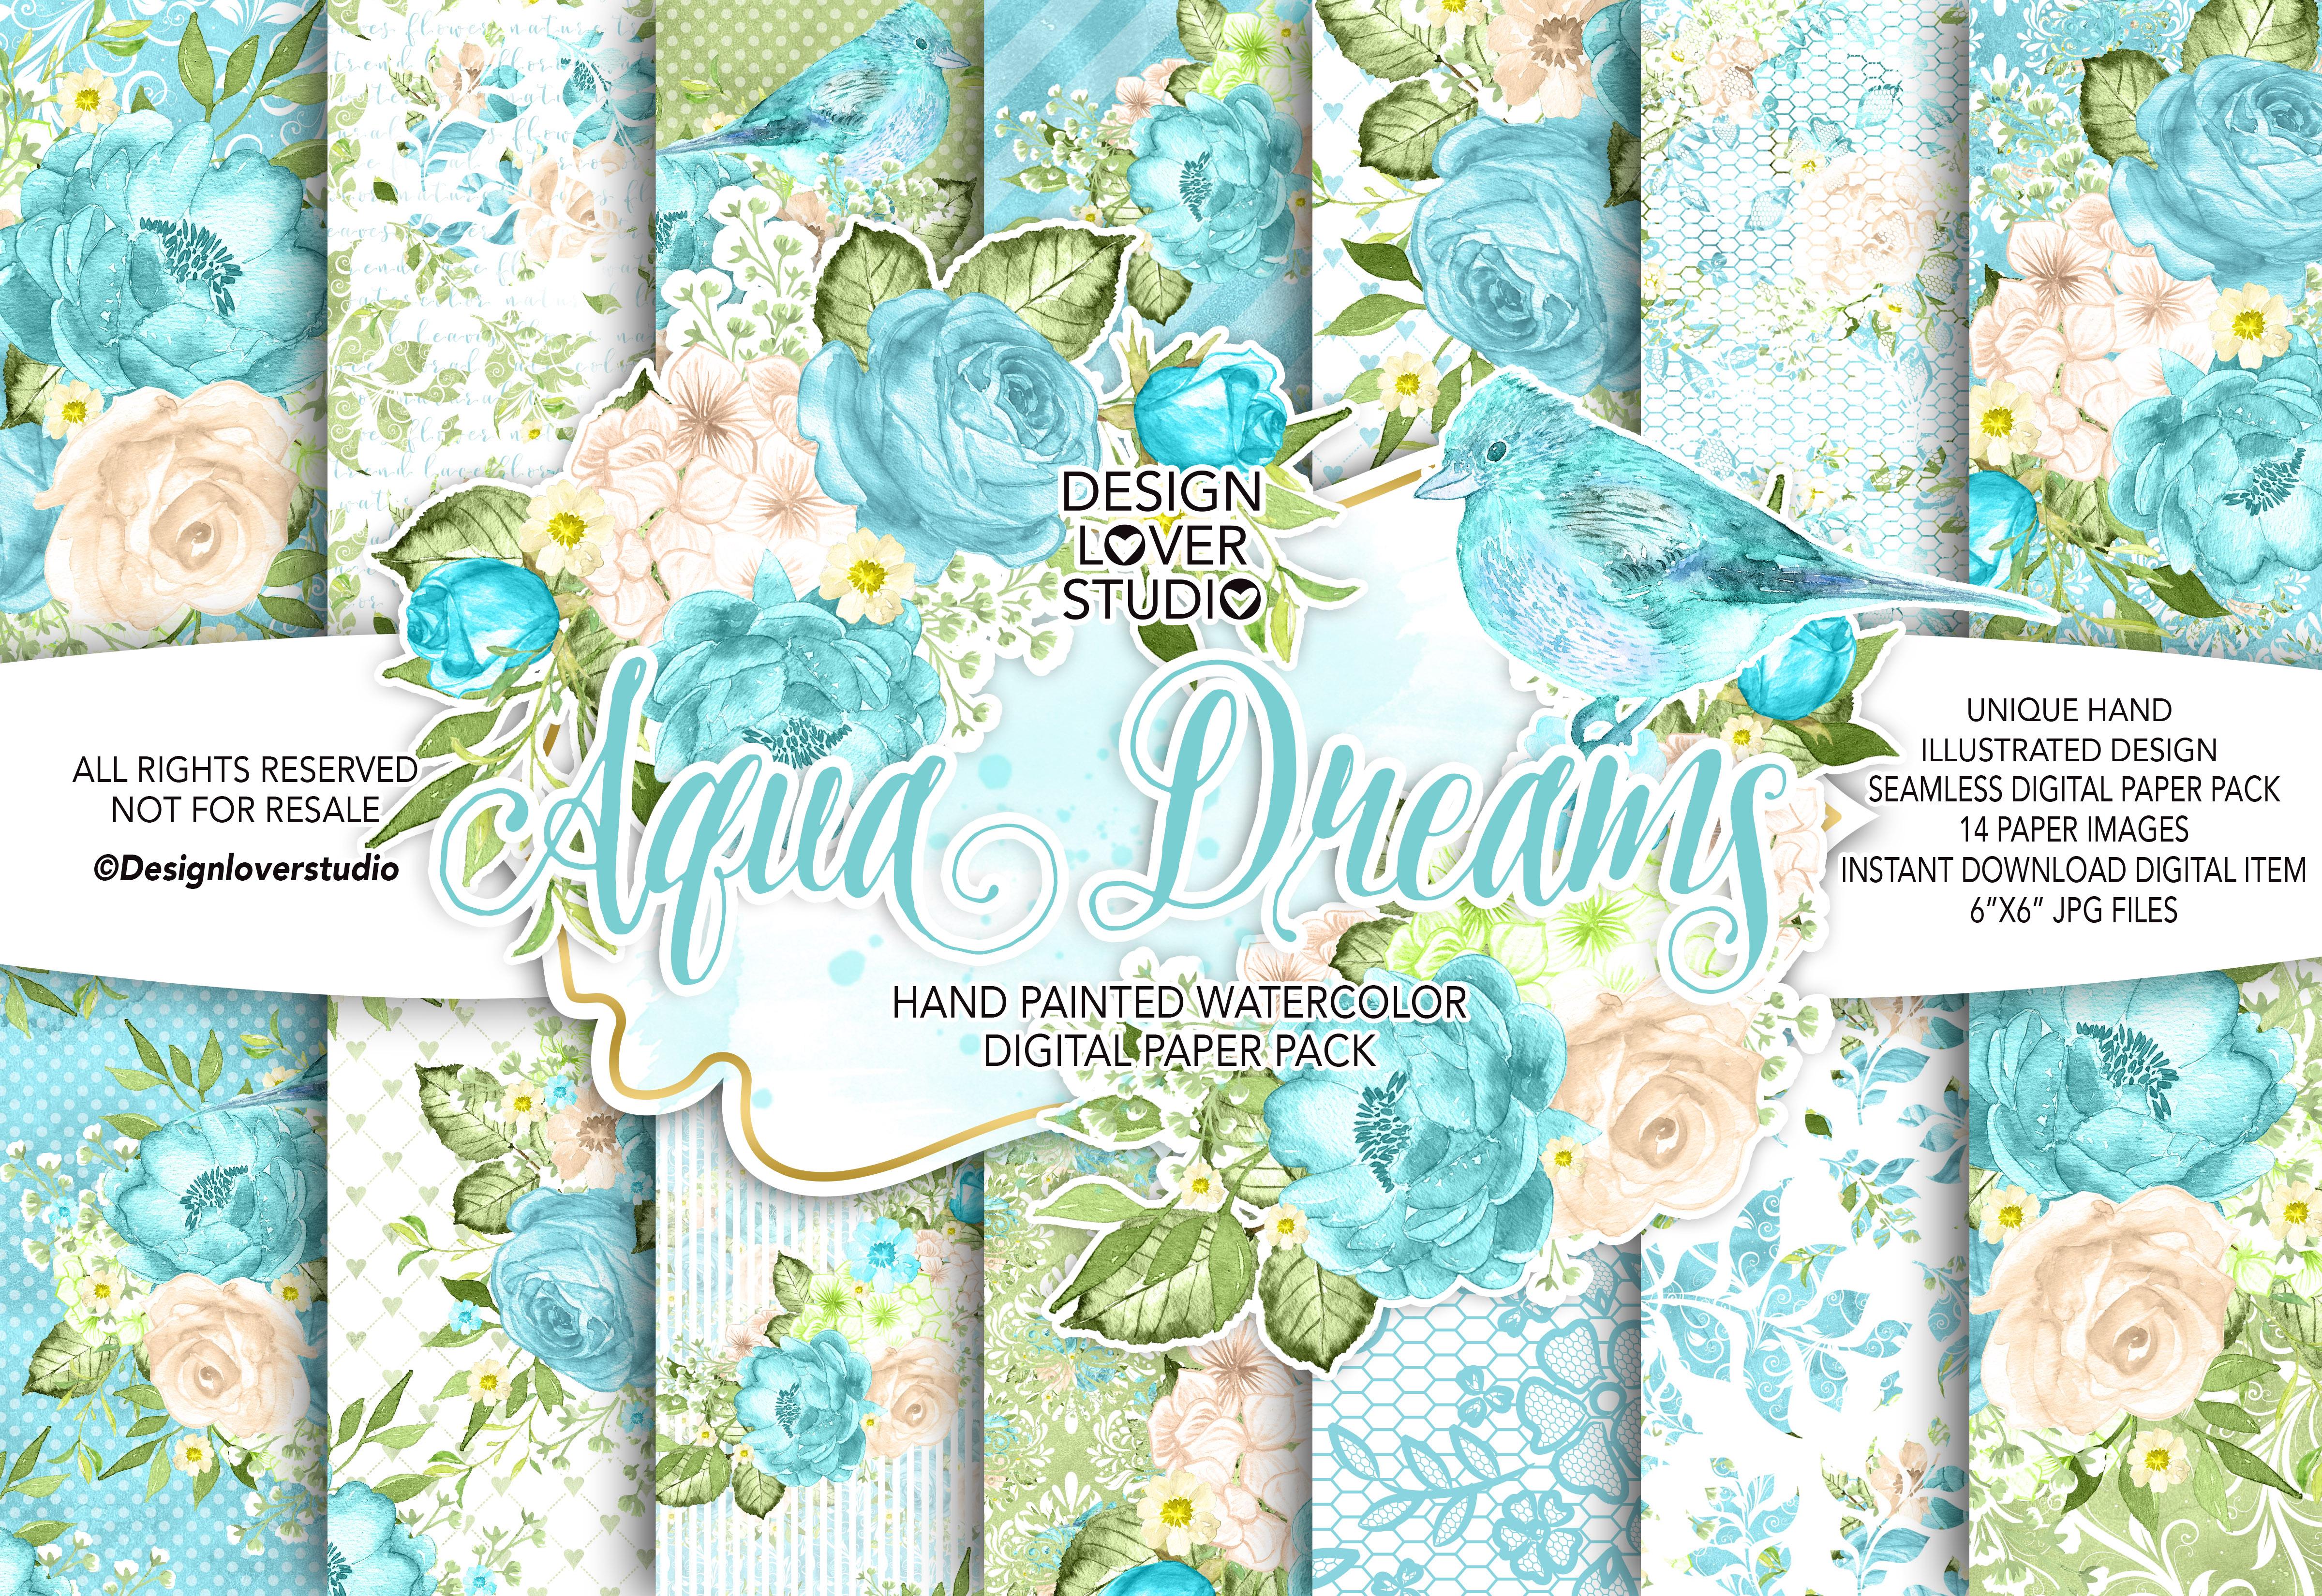 Watercolor AQUA DREAMS DP pack example image 1